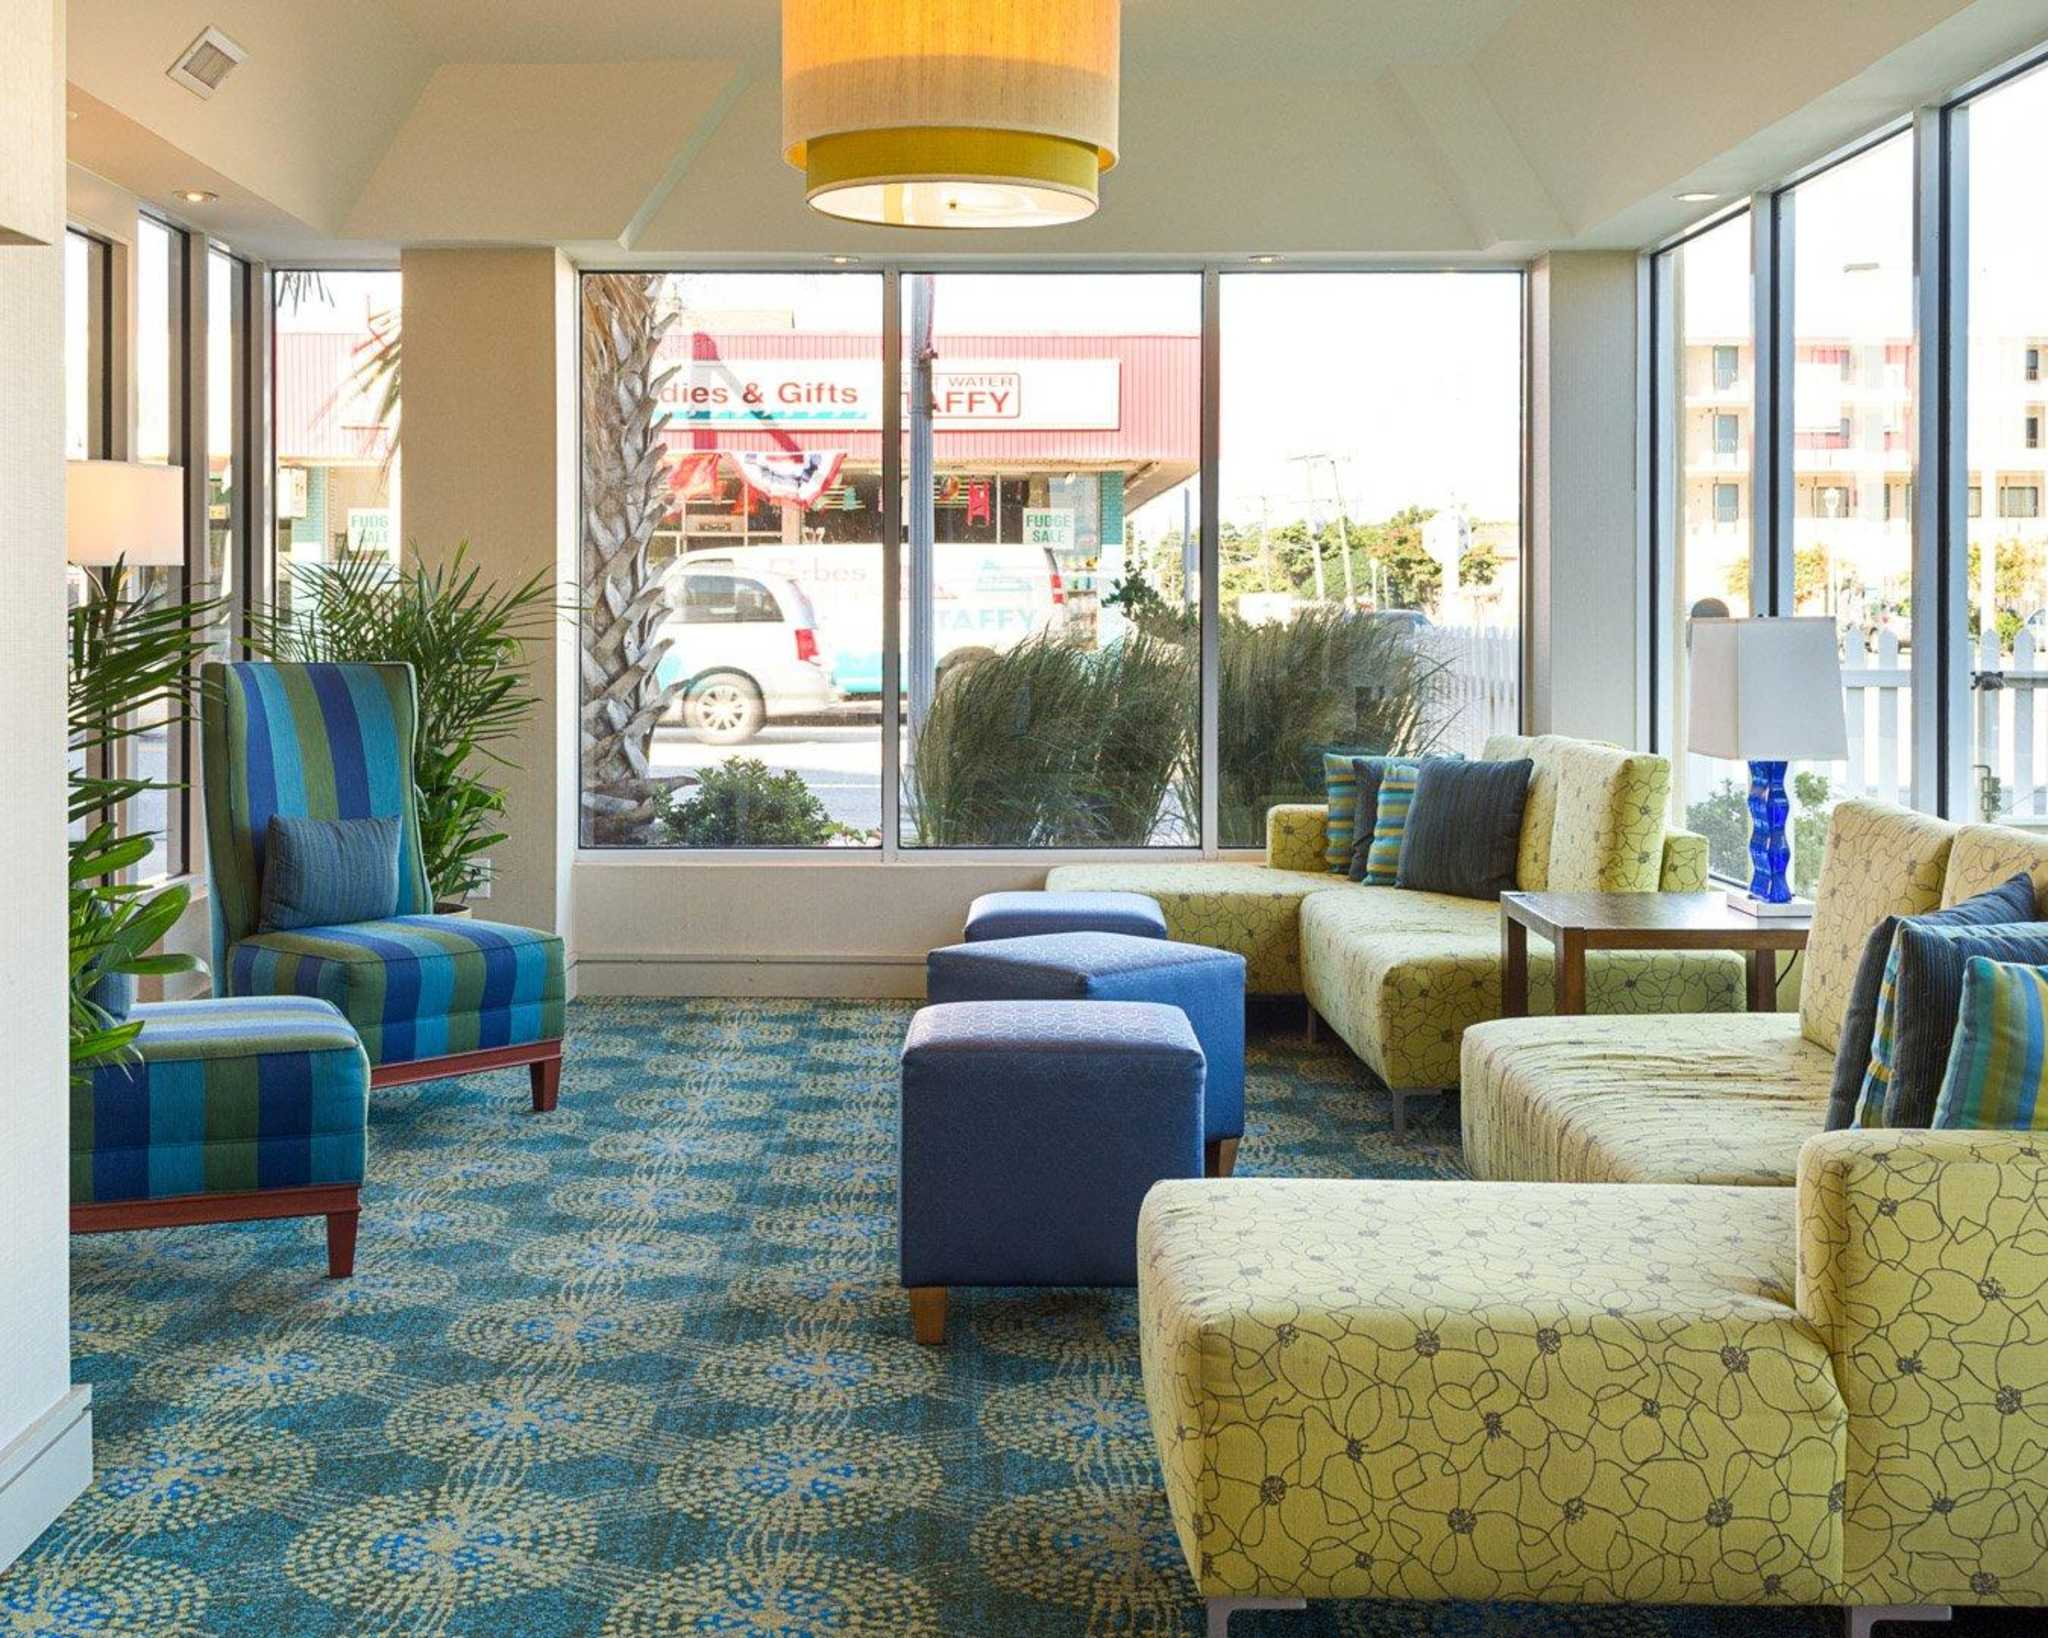 Comfort Suites Beachfront image 11